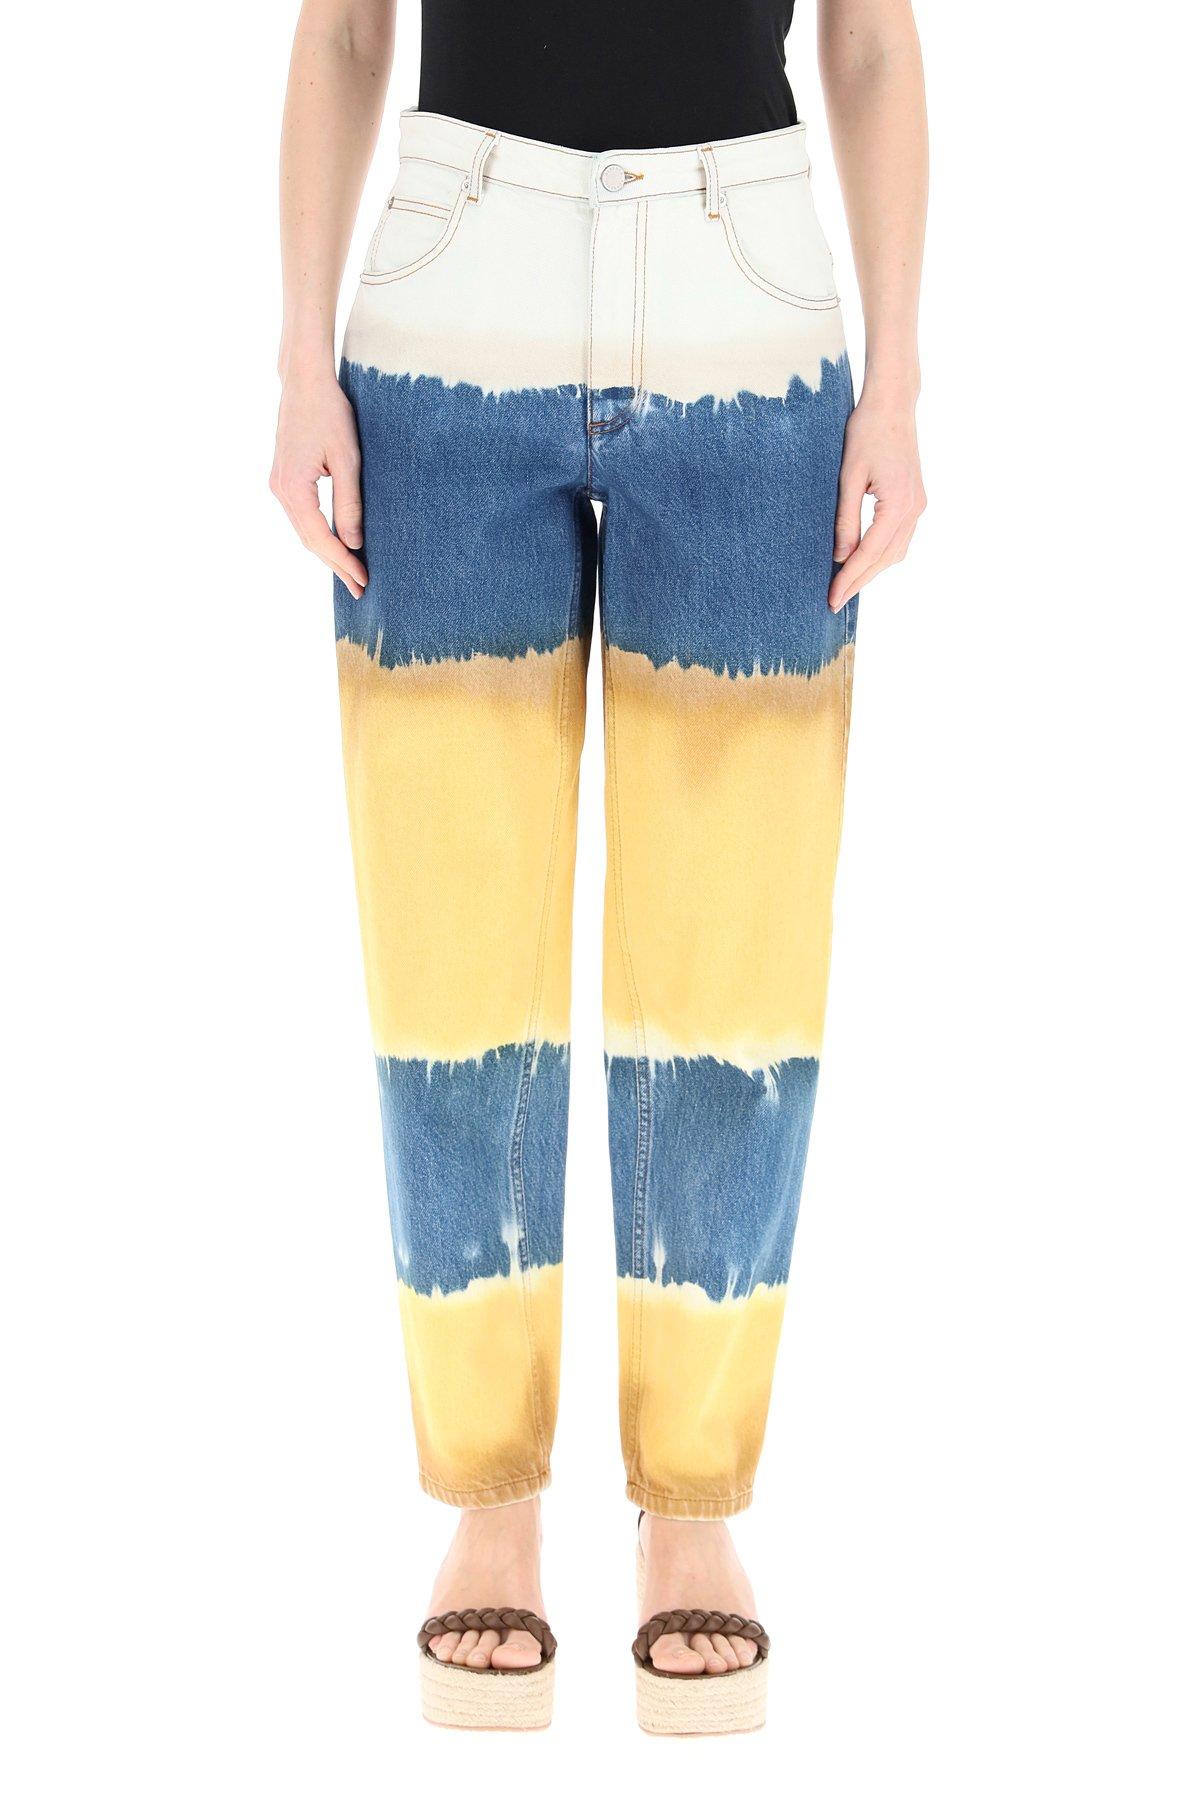 Alberta ferretti pantaloni tie-dye i love summer